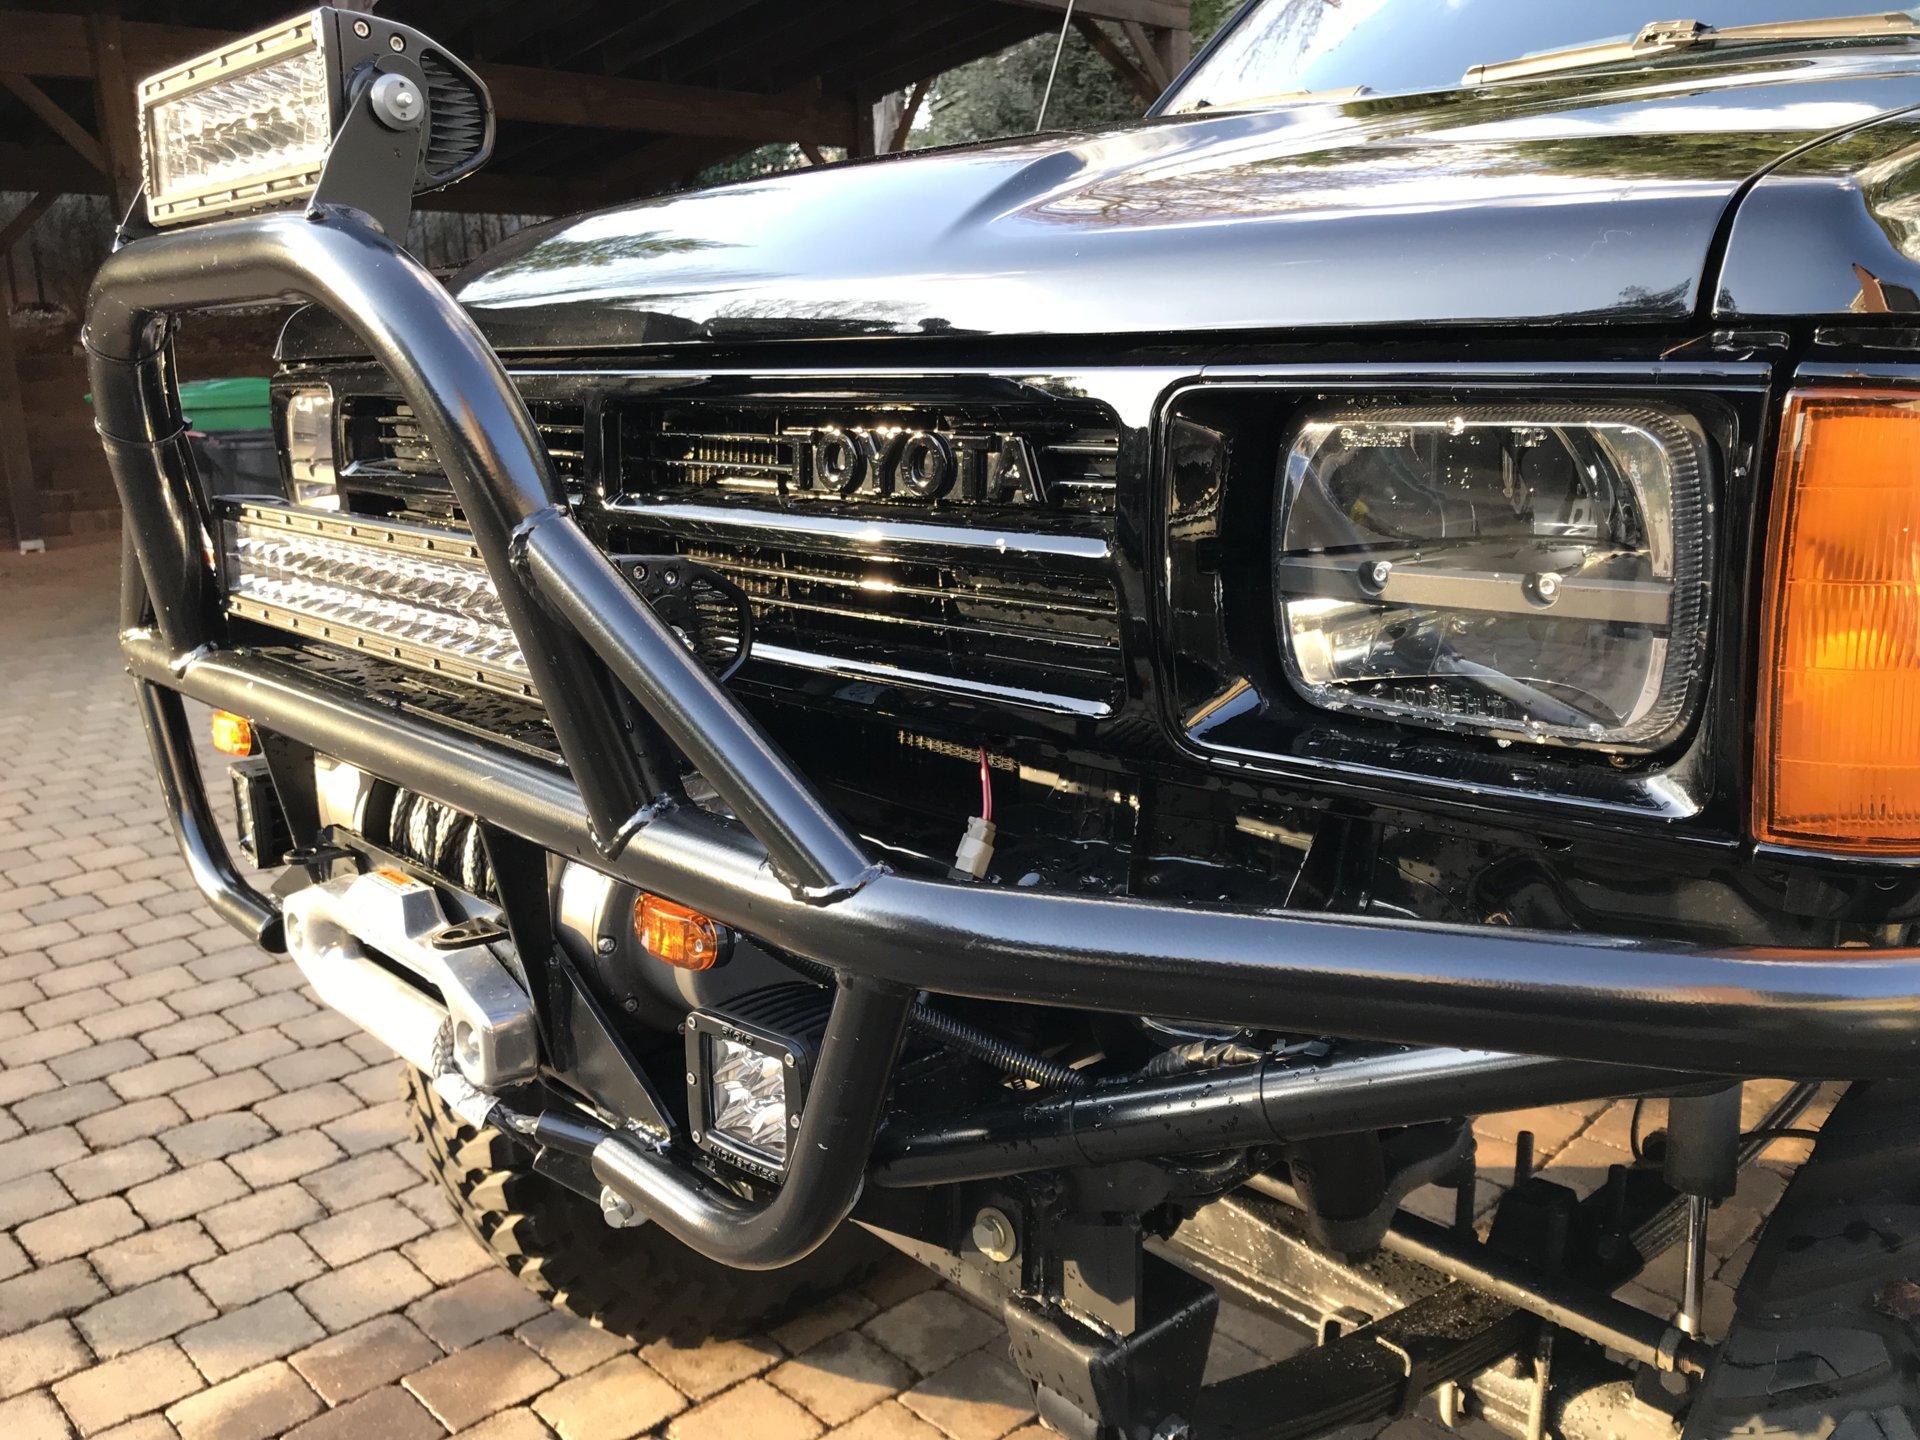 For Sale 1987 Toyota Xtracab 4x4 Built Ih8mud Forum